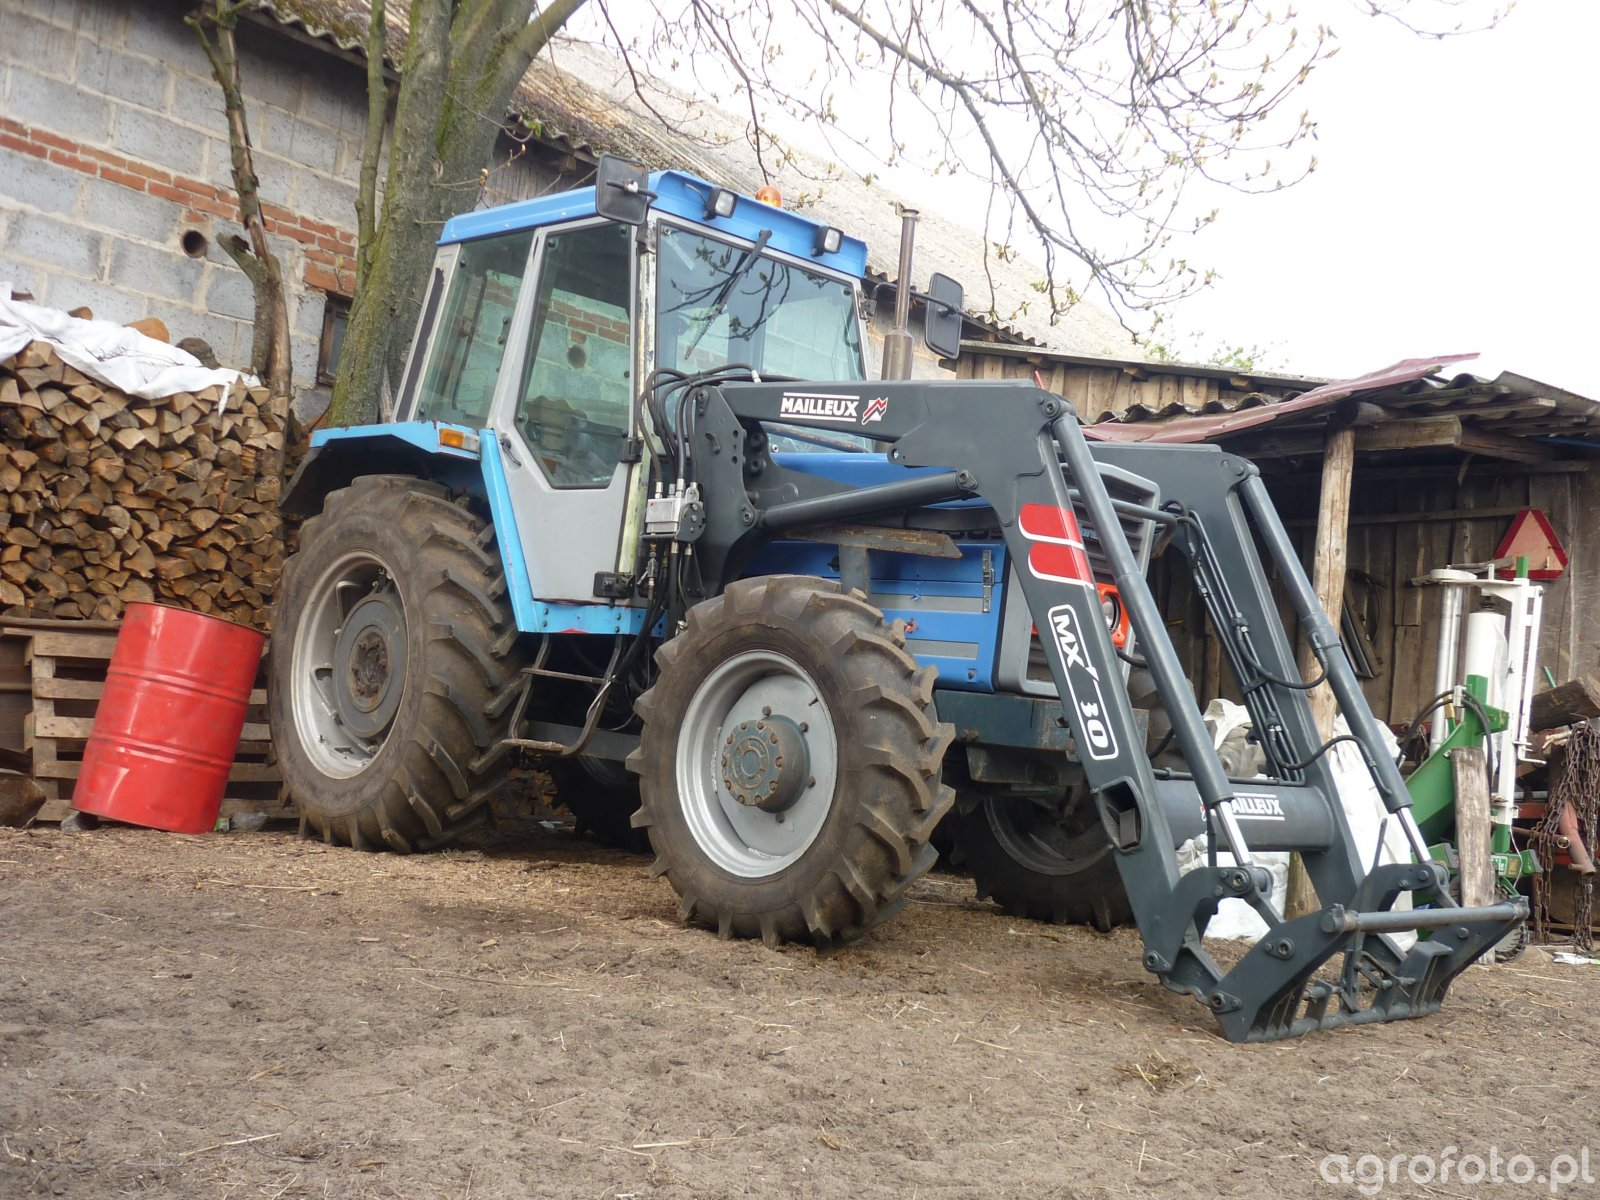 Landini 6550 + mallineux 80